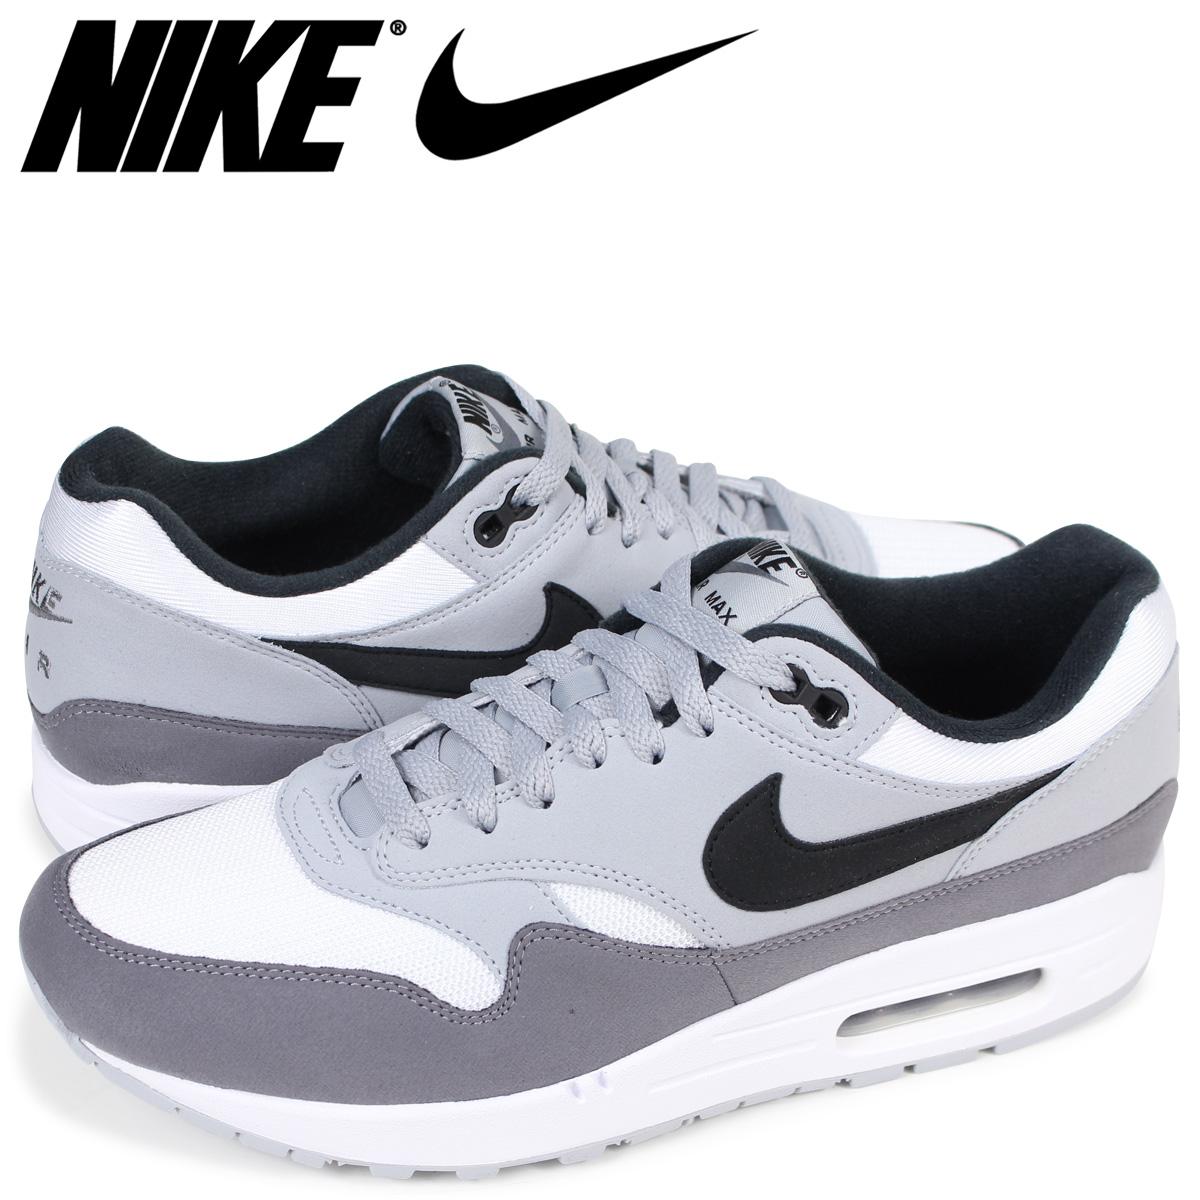 nike air max 1 sneaker Shop Clothing